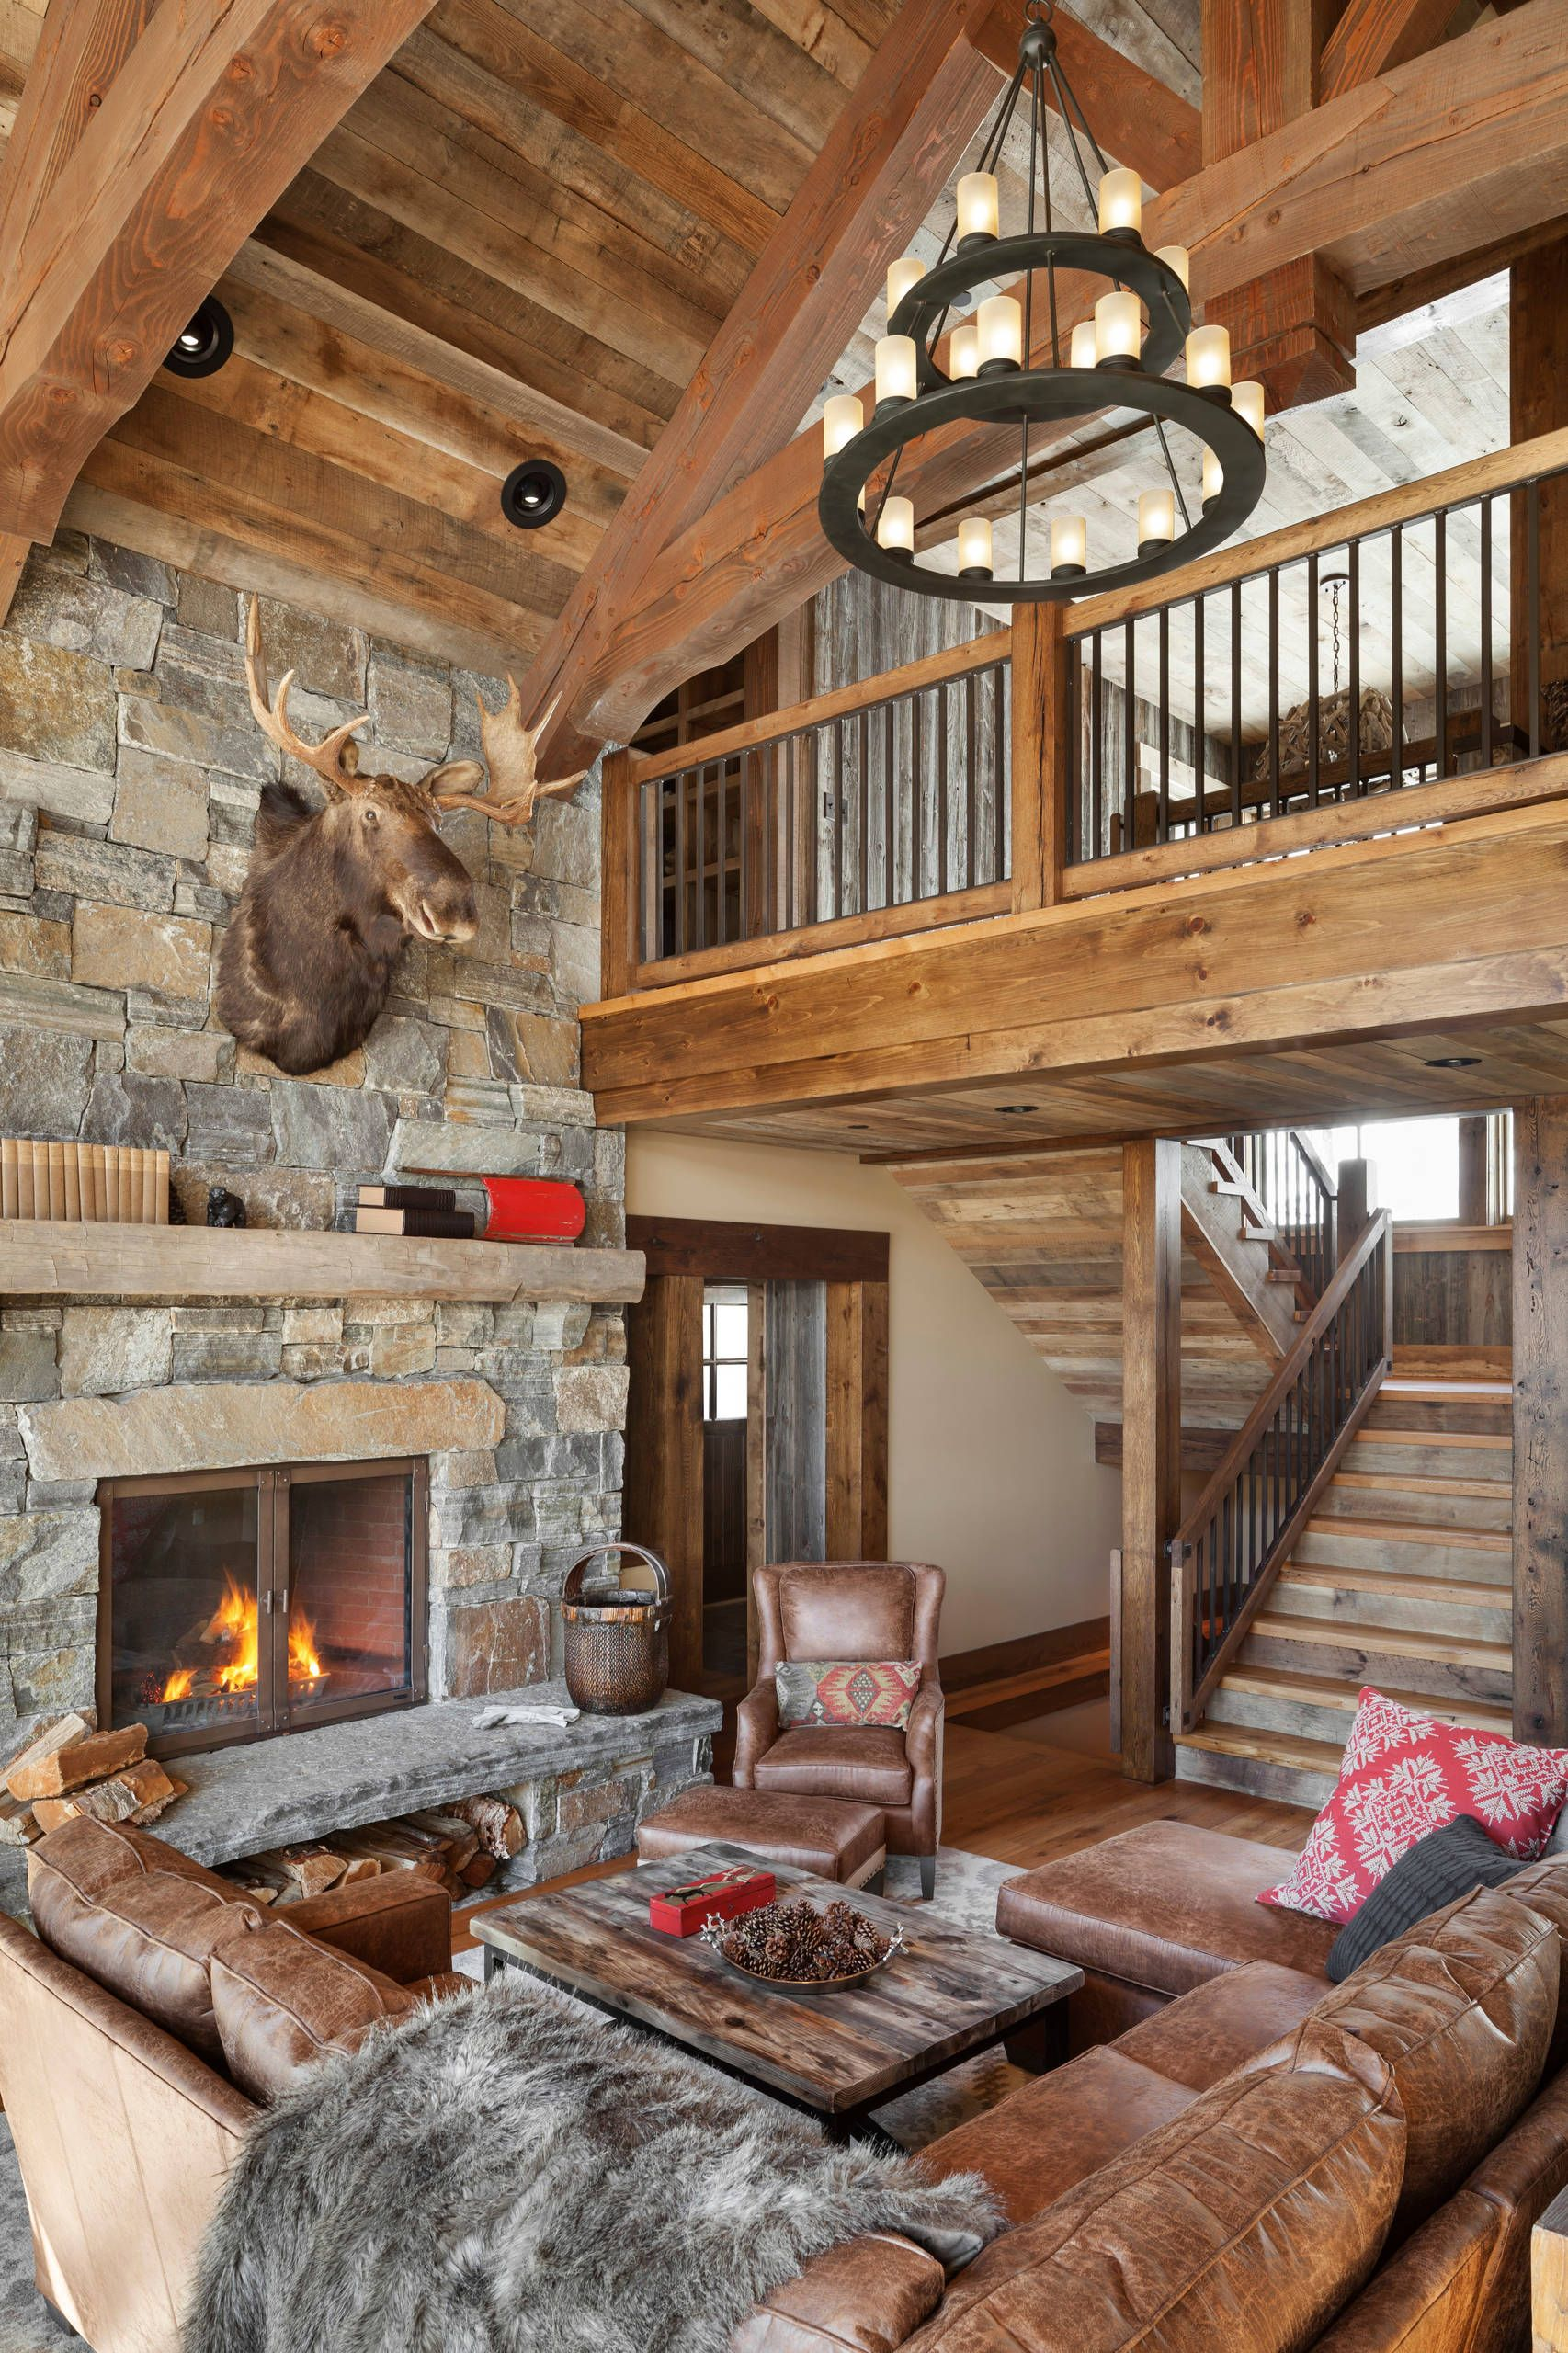 Best Of Rustic Living Rooms Design Ideas Rustic Living Room Design Cabin Style Modern Cabin Decor #rustic #cabin #living #room